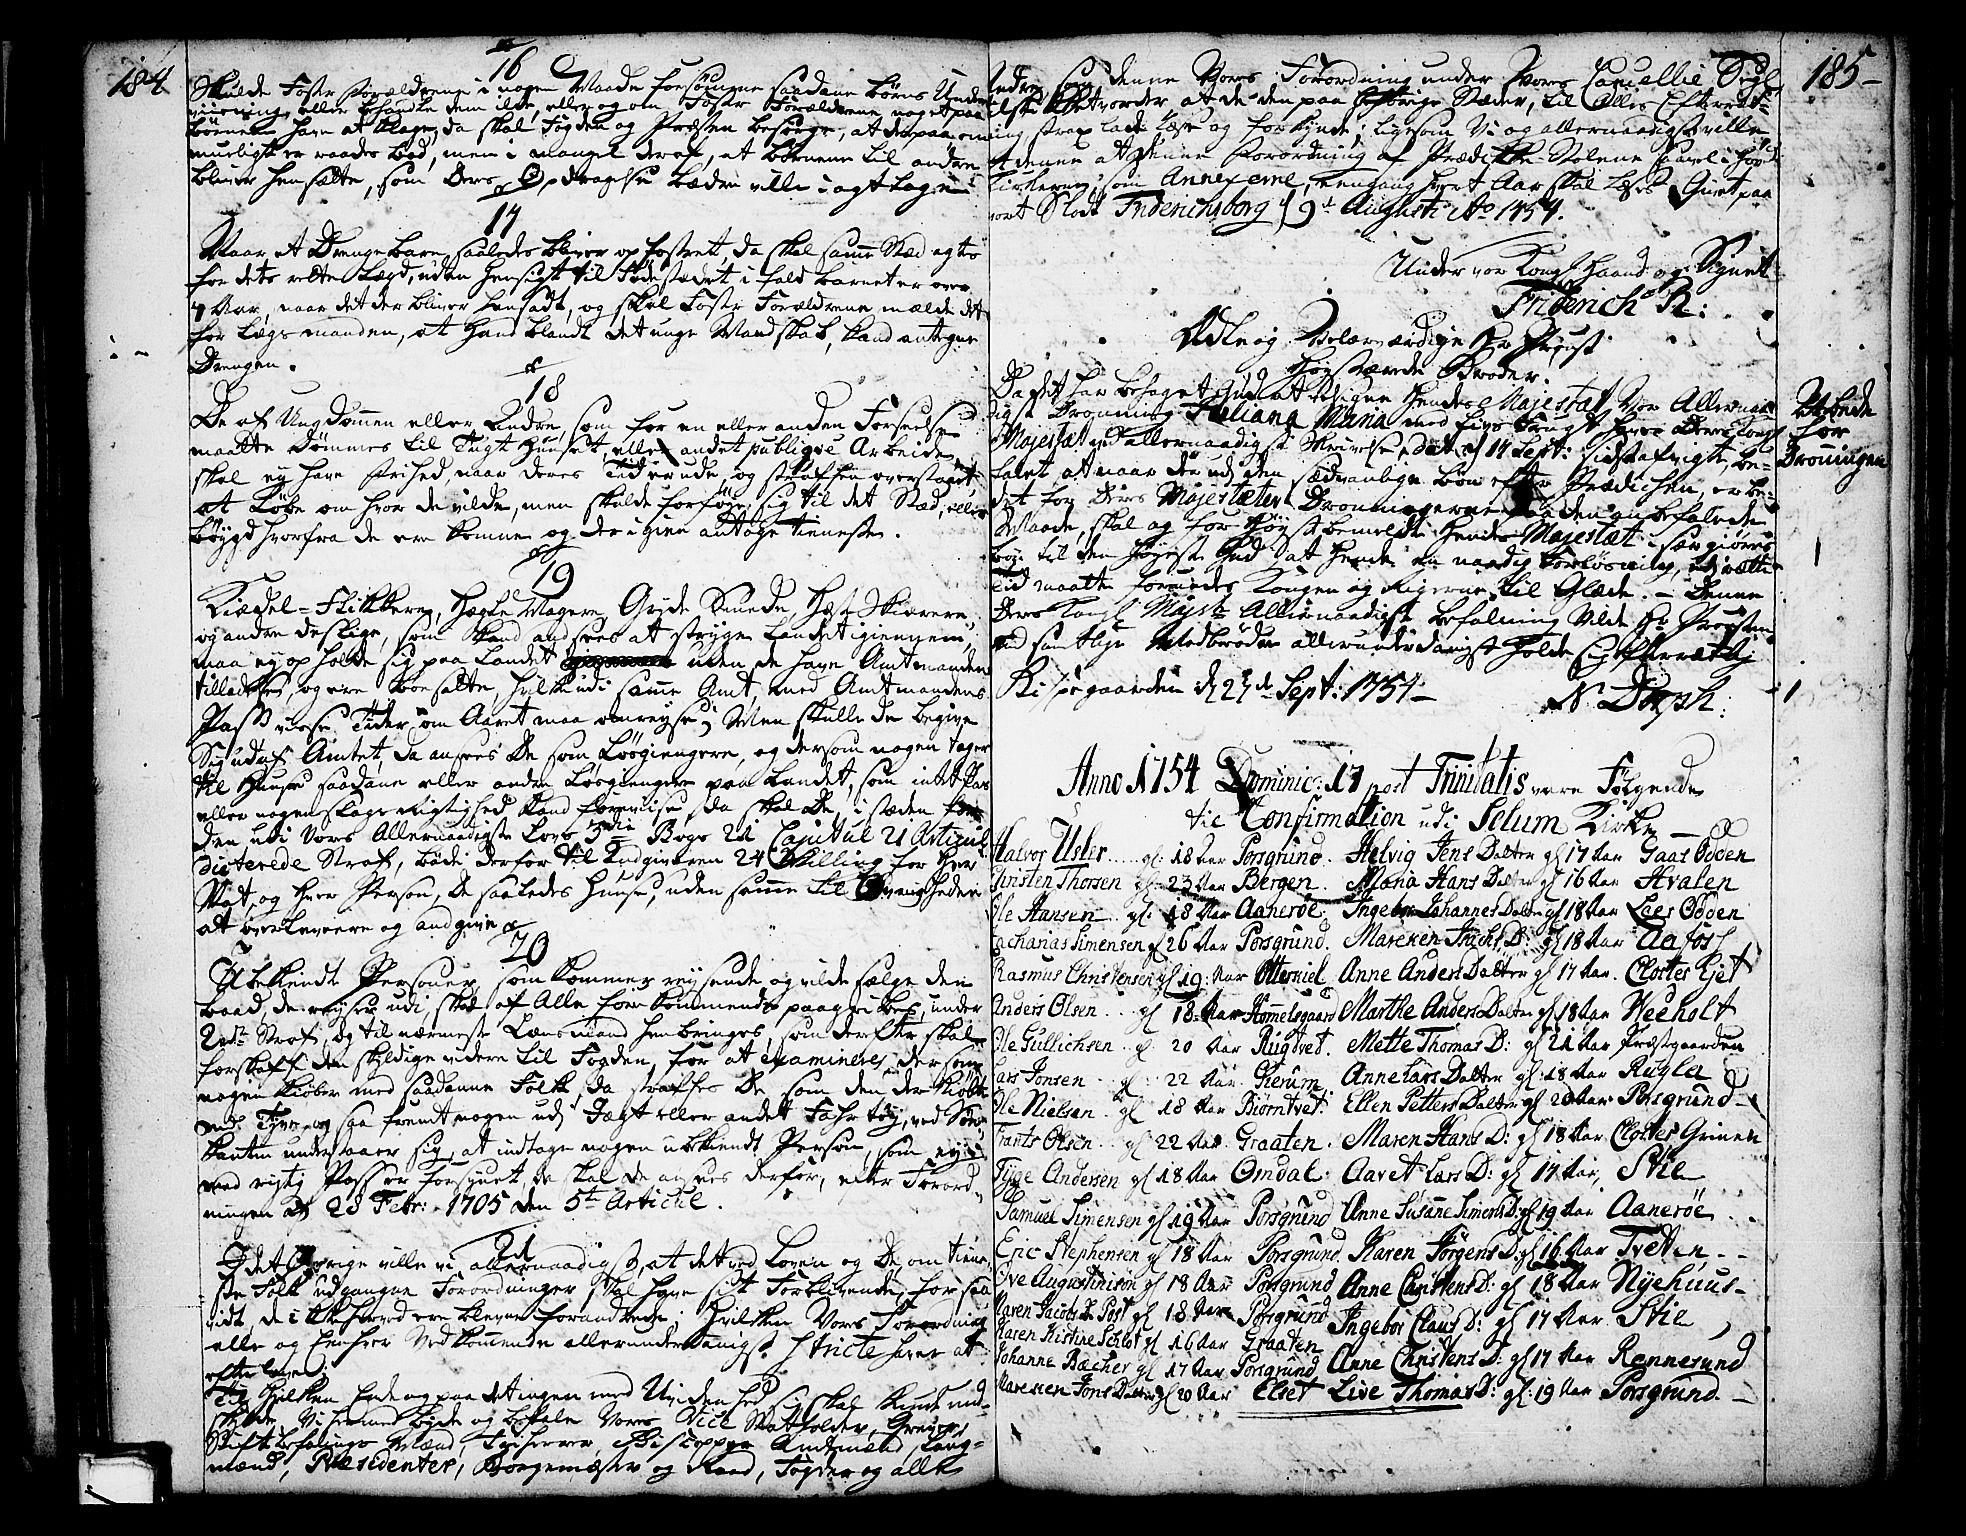 SAKO, Solum sokneprestkontor, A/Aa/L0002: Annen kirkebok nr. 2, 1743-1791, s. 184-185